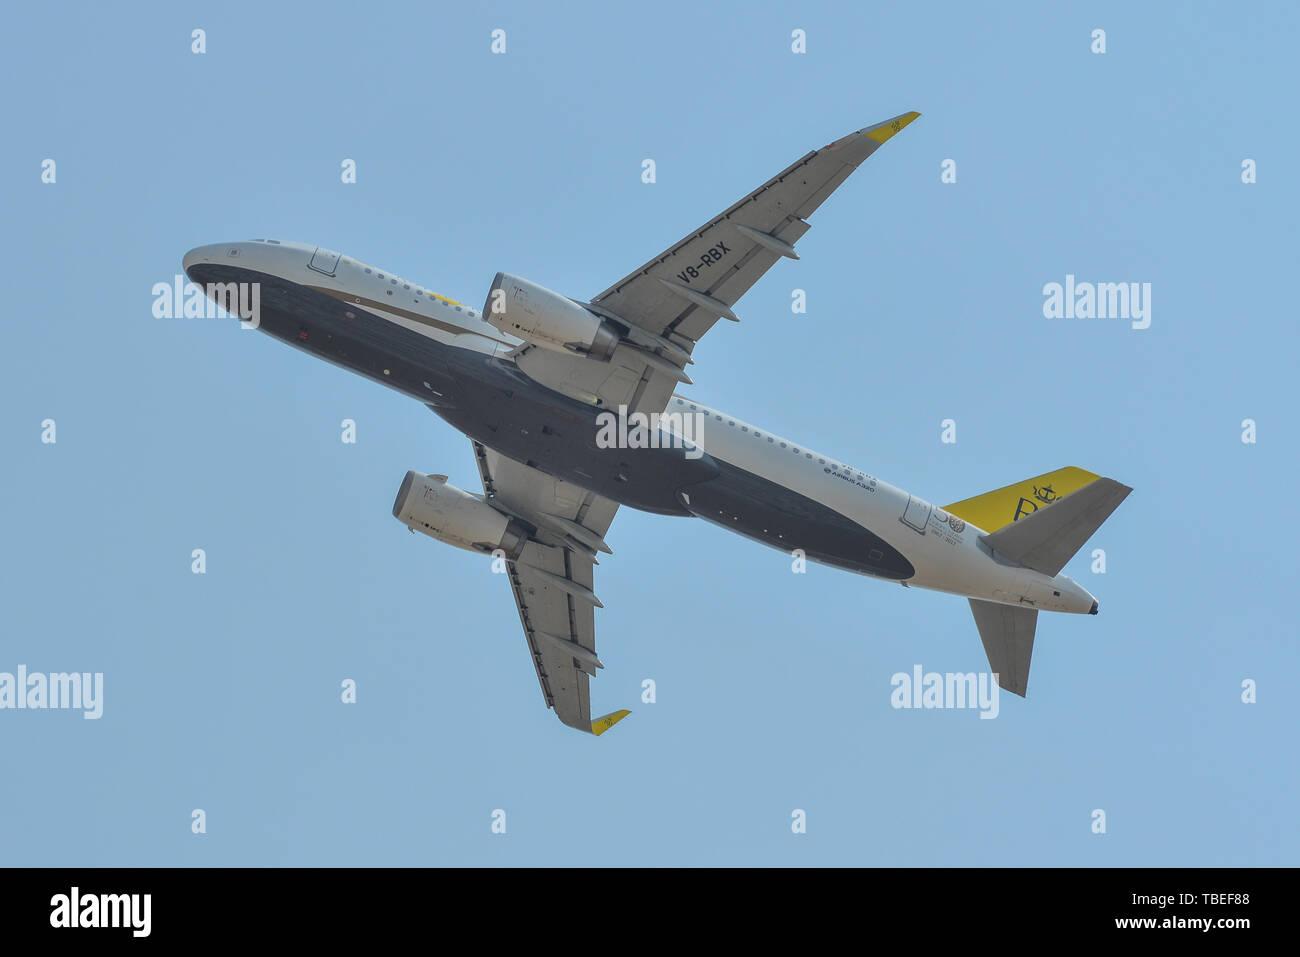 Saigon, Vietnam - Feb 25, 2019  V8-RBX Royal Brunei Airlines Airbus